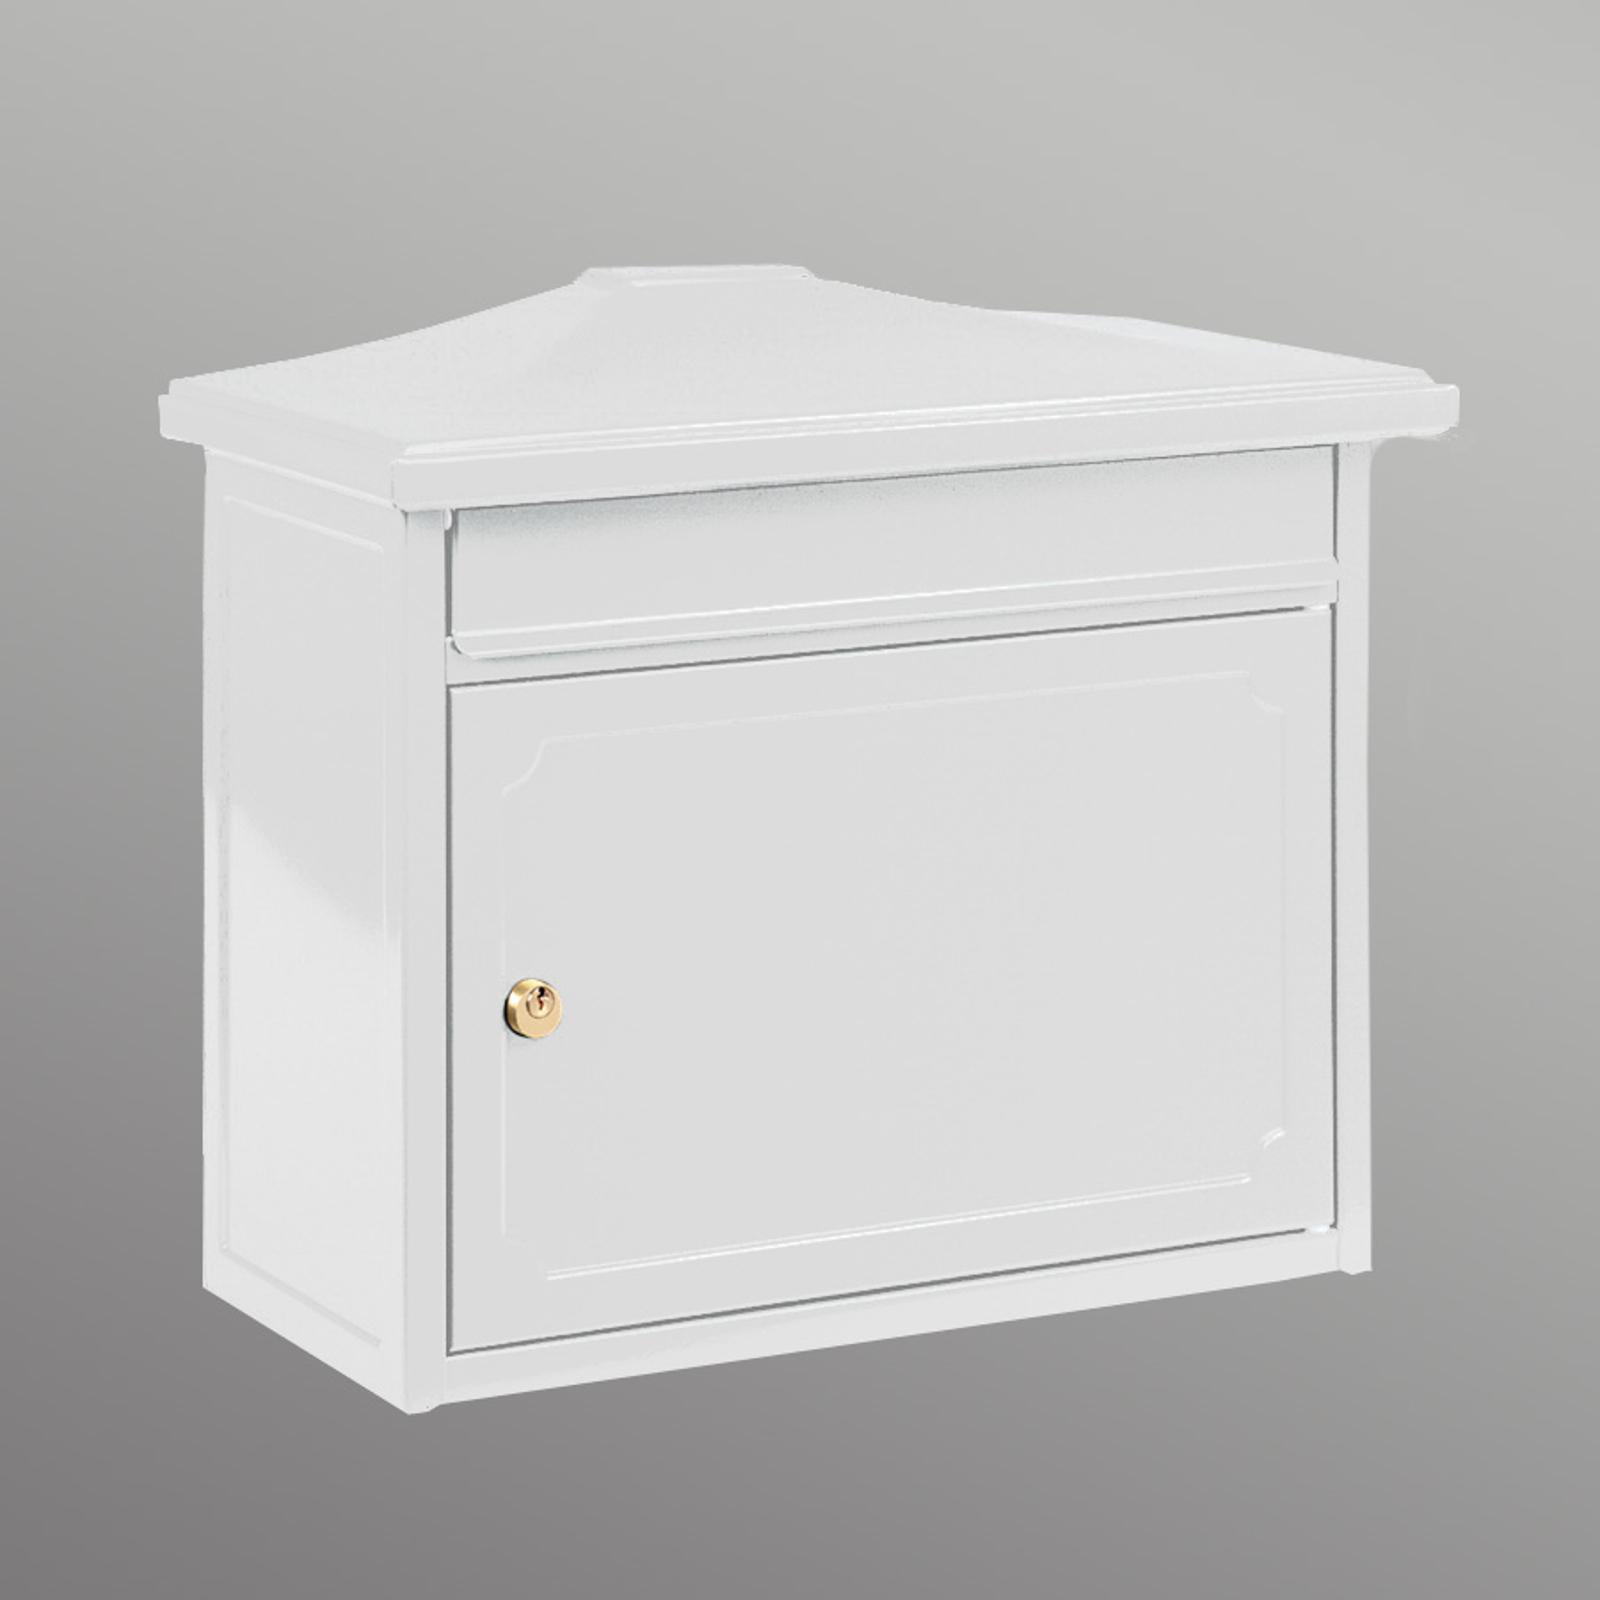 Boîte aux lettres KOPENHAGEN blanche